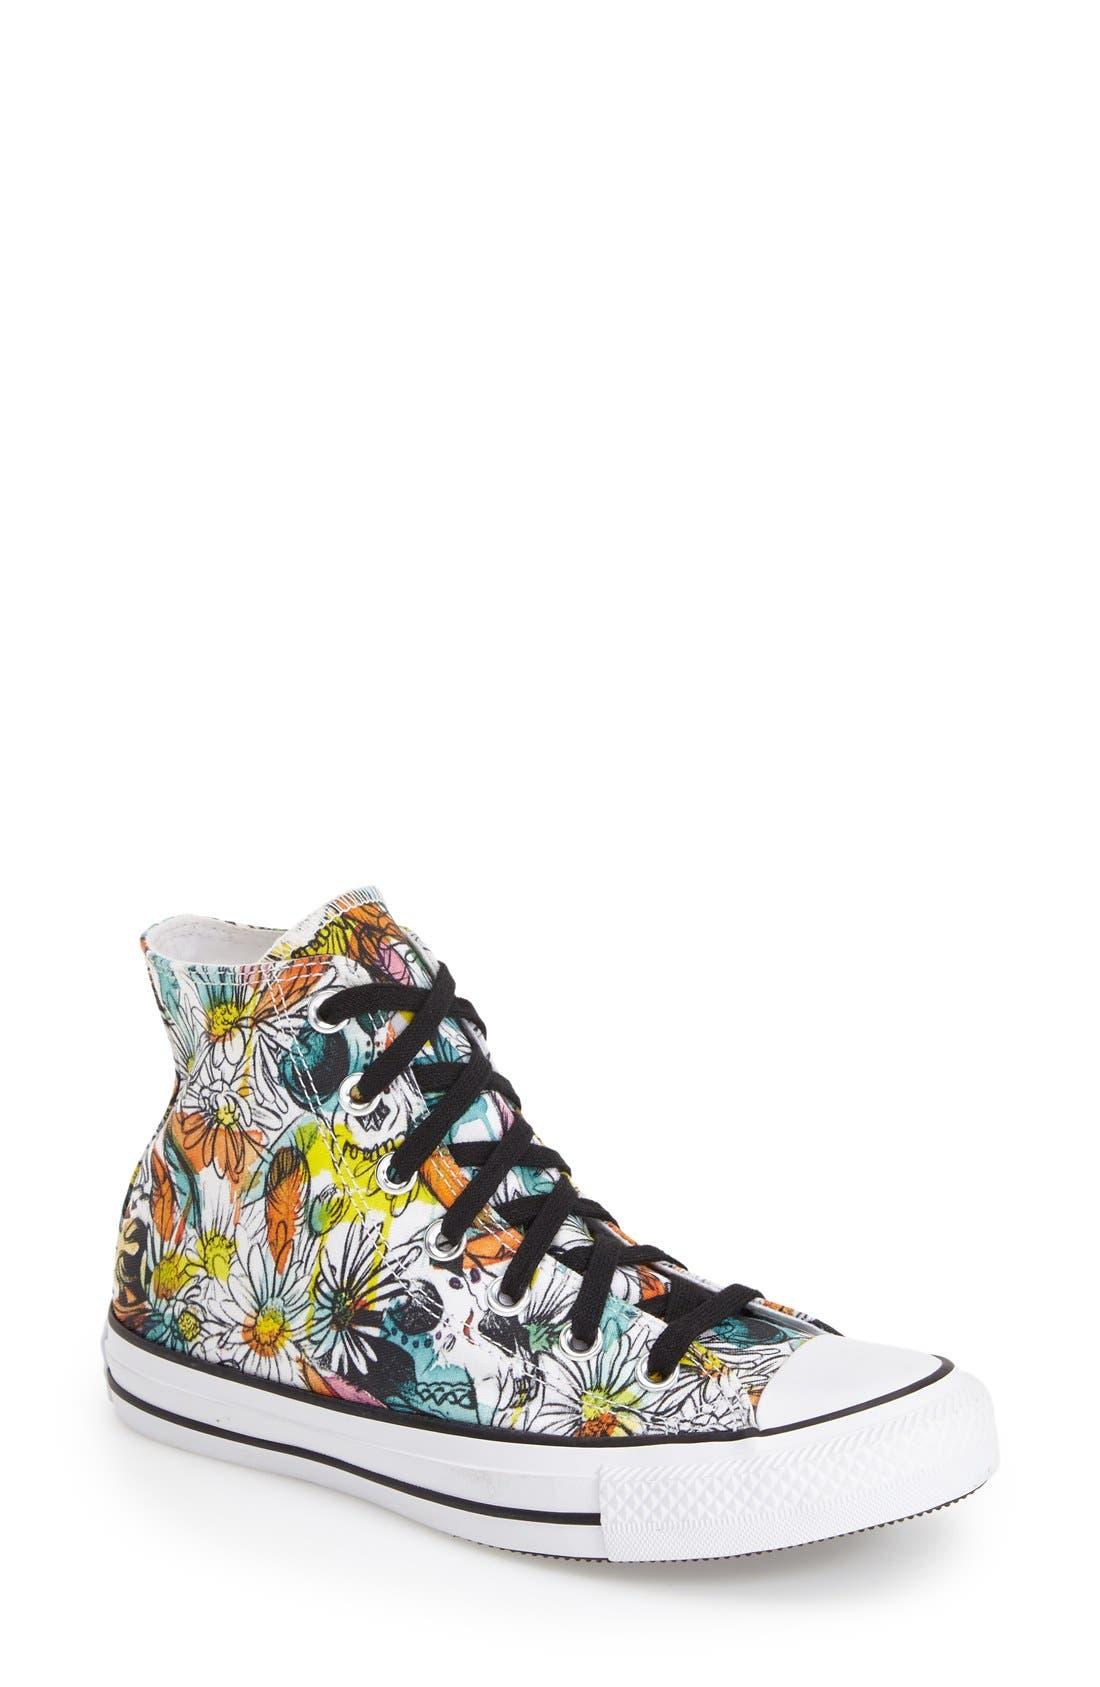 Main Image - Converse Chuck Taylor® All Star® 'Floral' High Top Sneaker (Women)